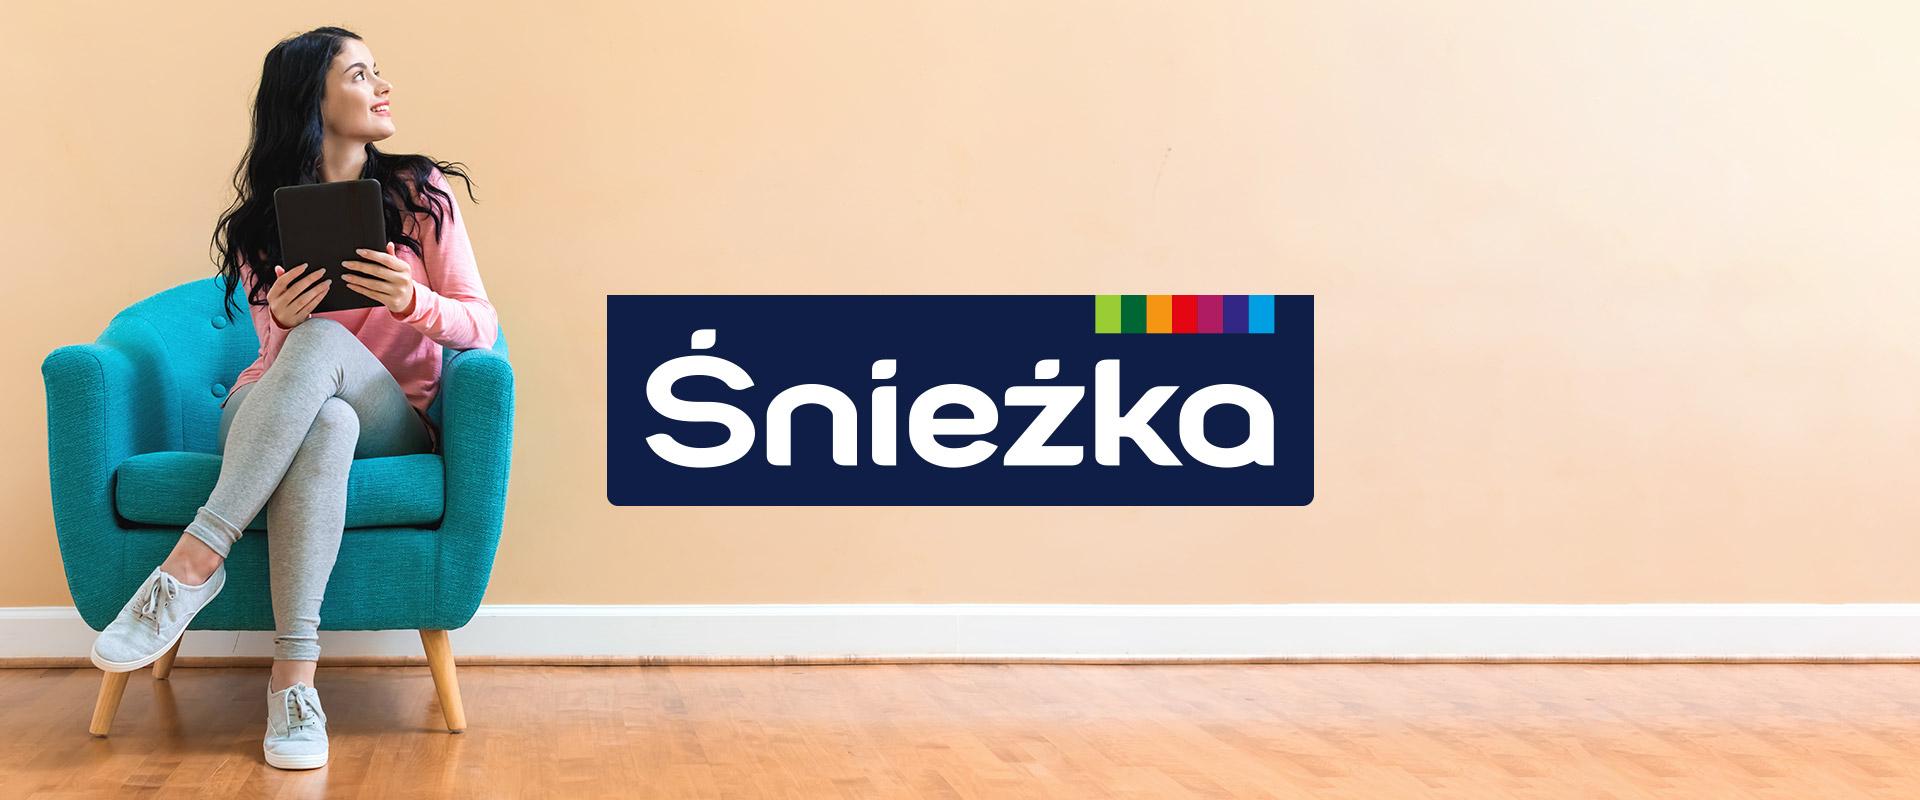 sniezka_Kafelek_1920x800px